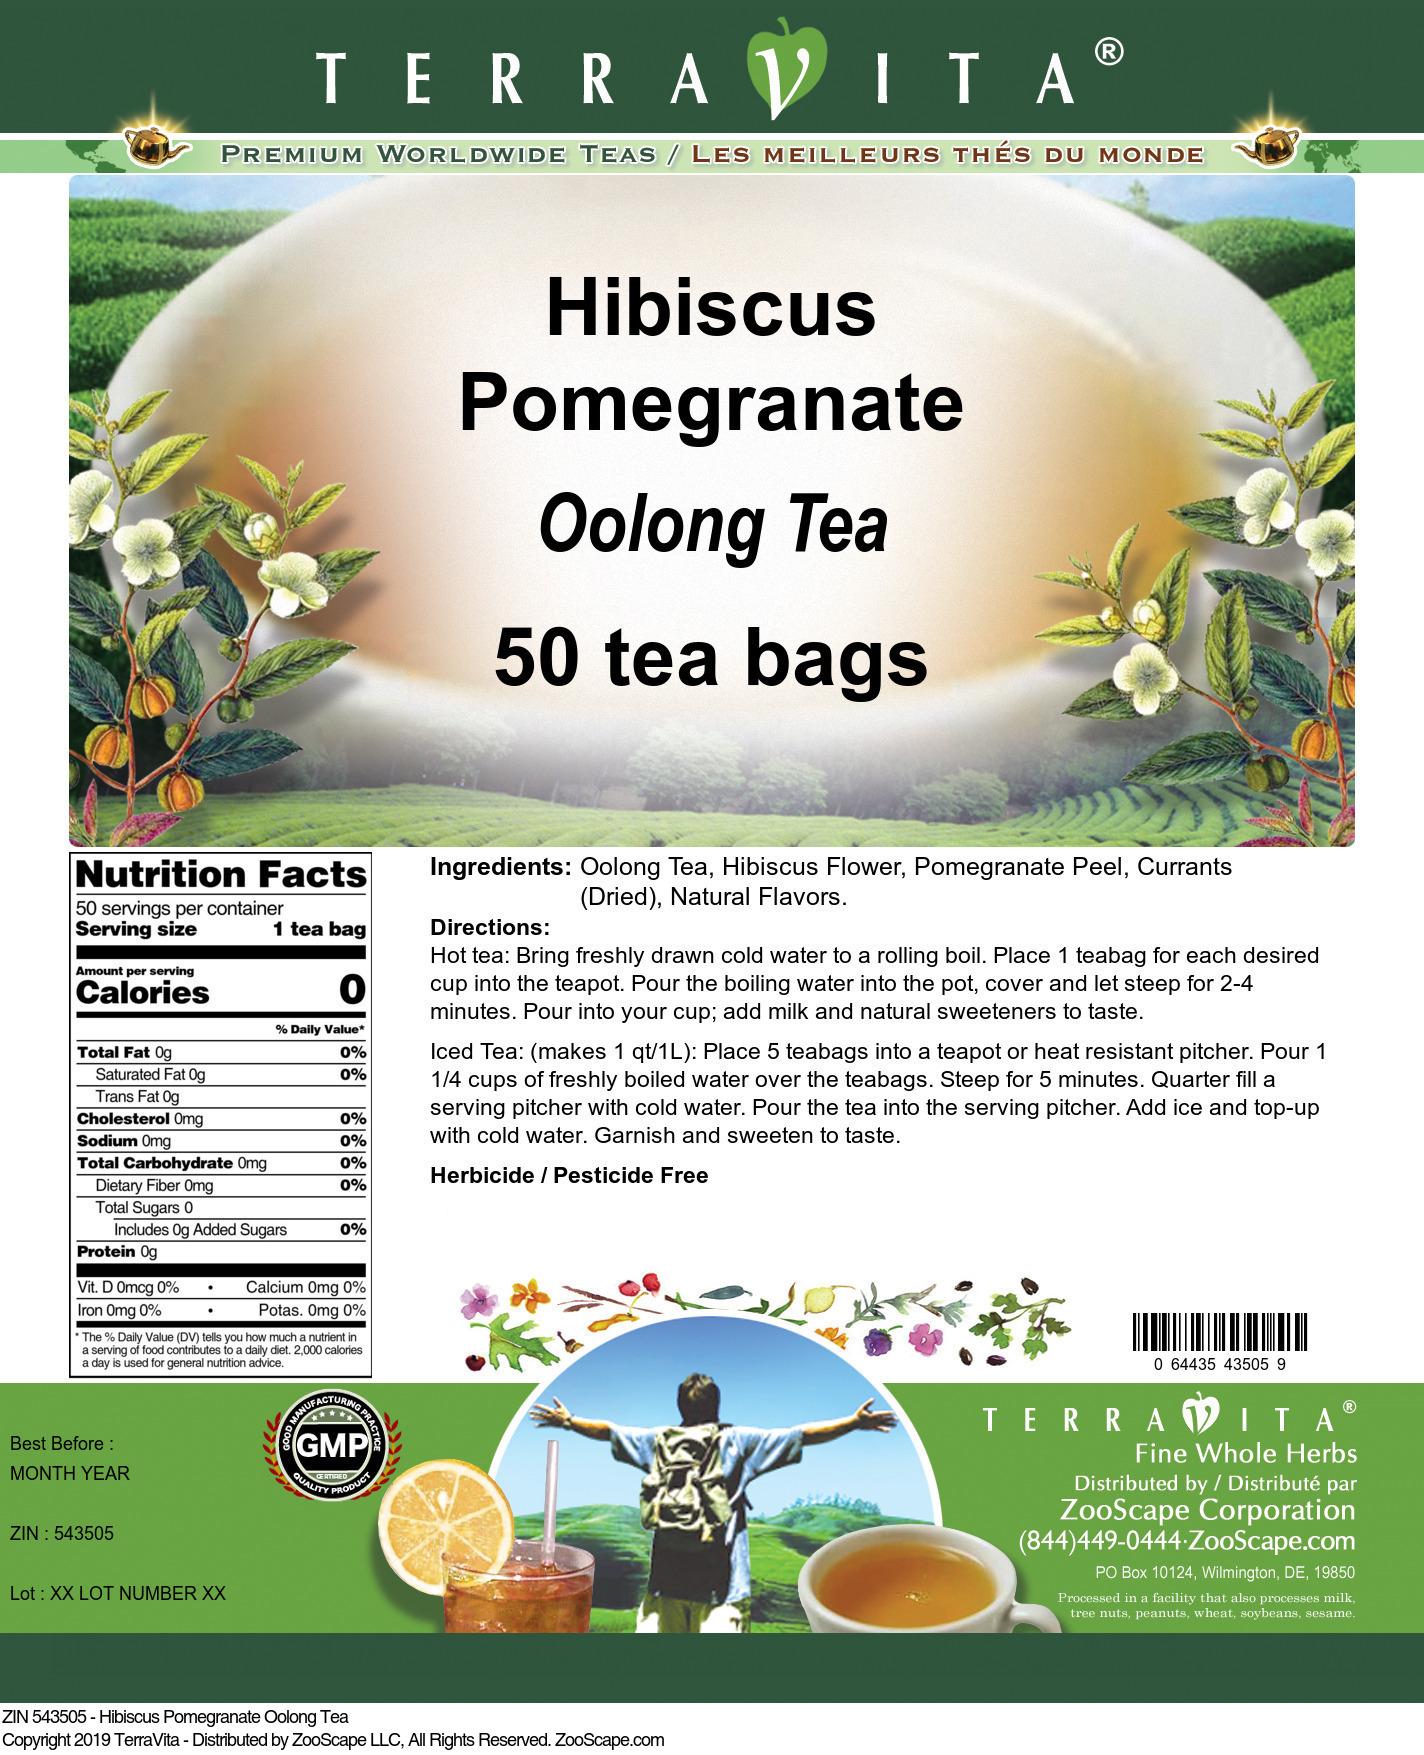 Hibiscus Pomegranate Oolong Tea